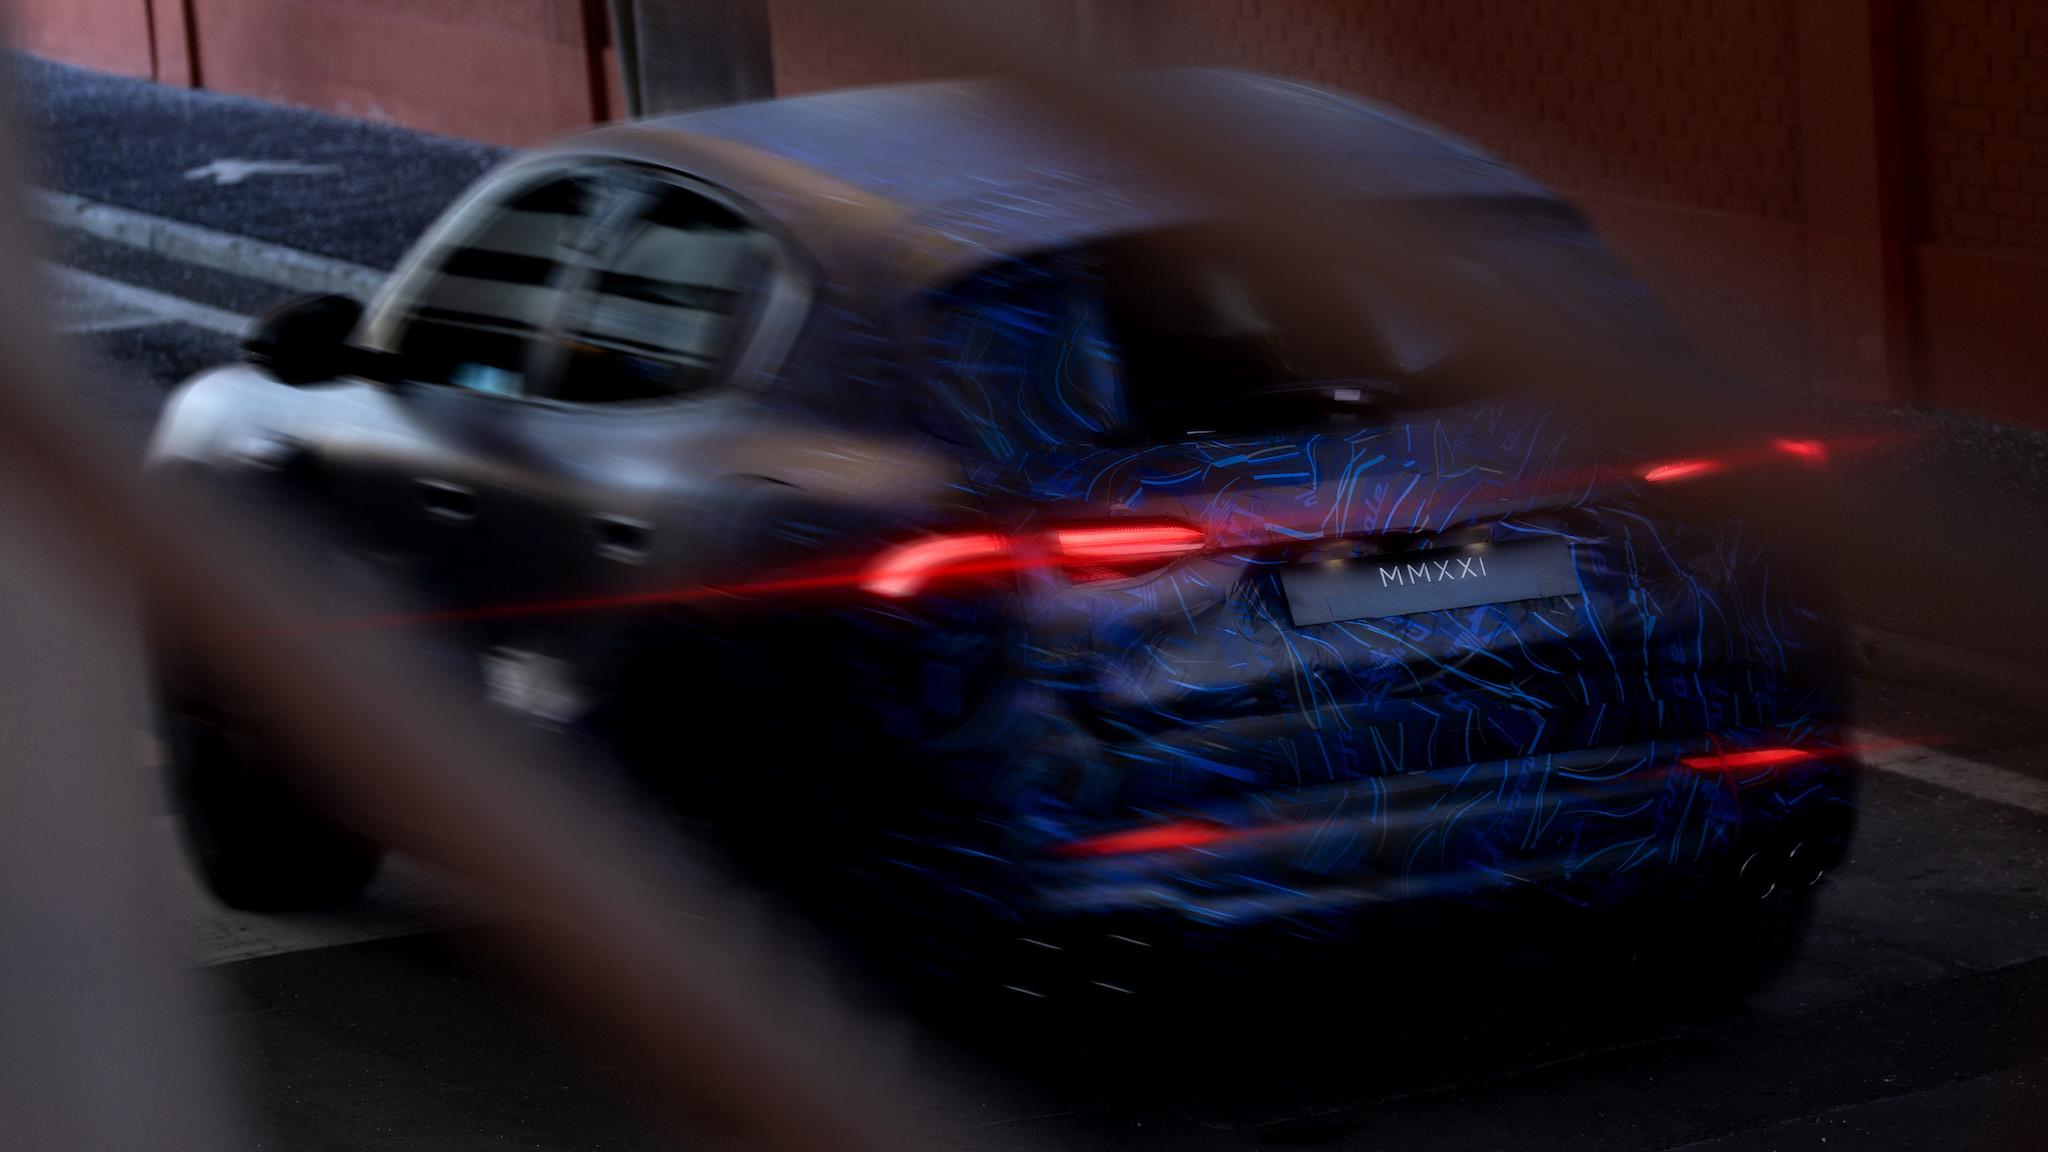 ▲ Maserati Grecale 原型車模糊現身,年底正式發表